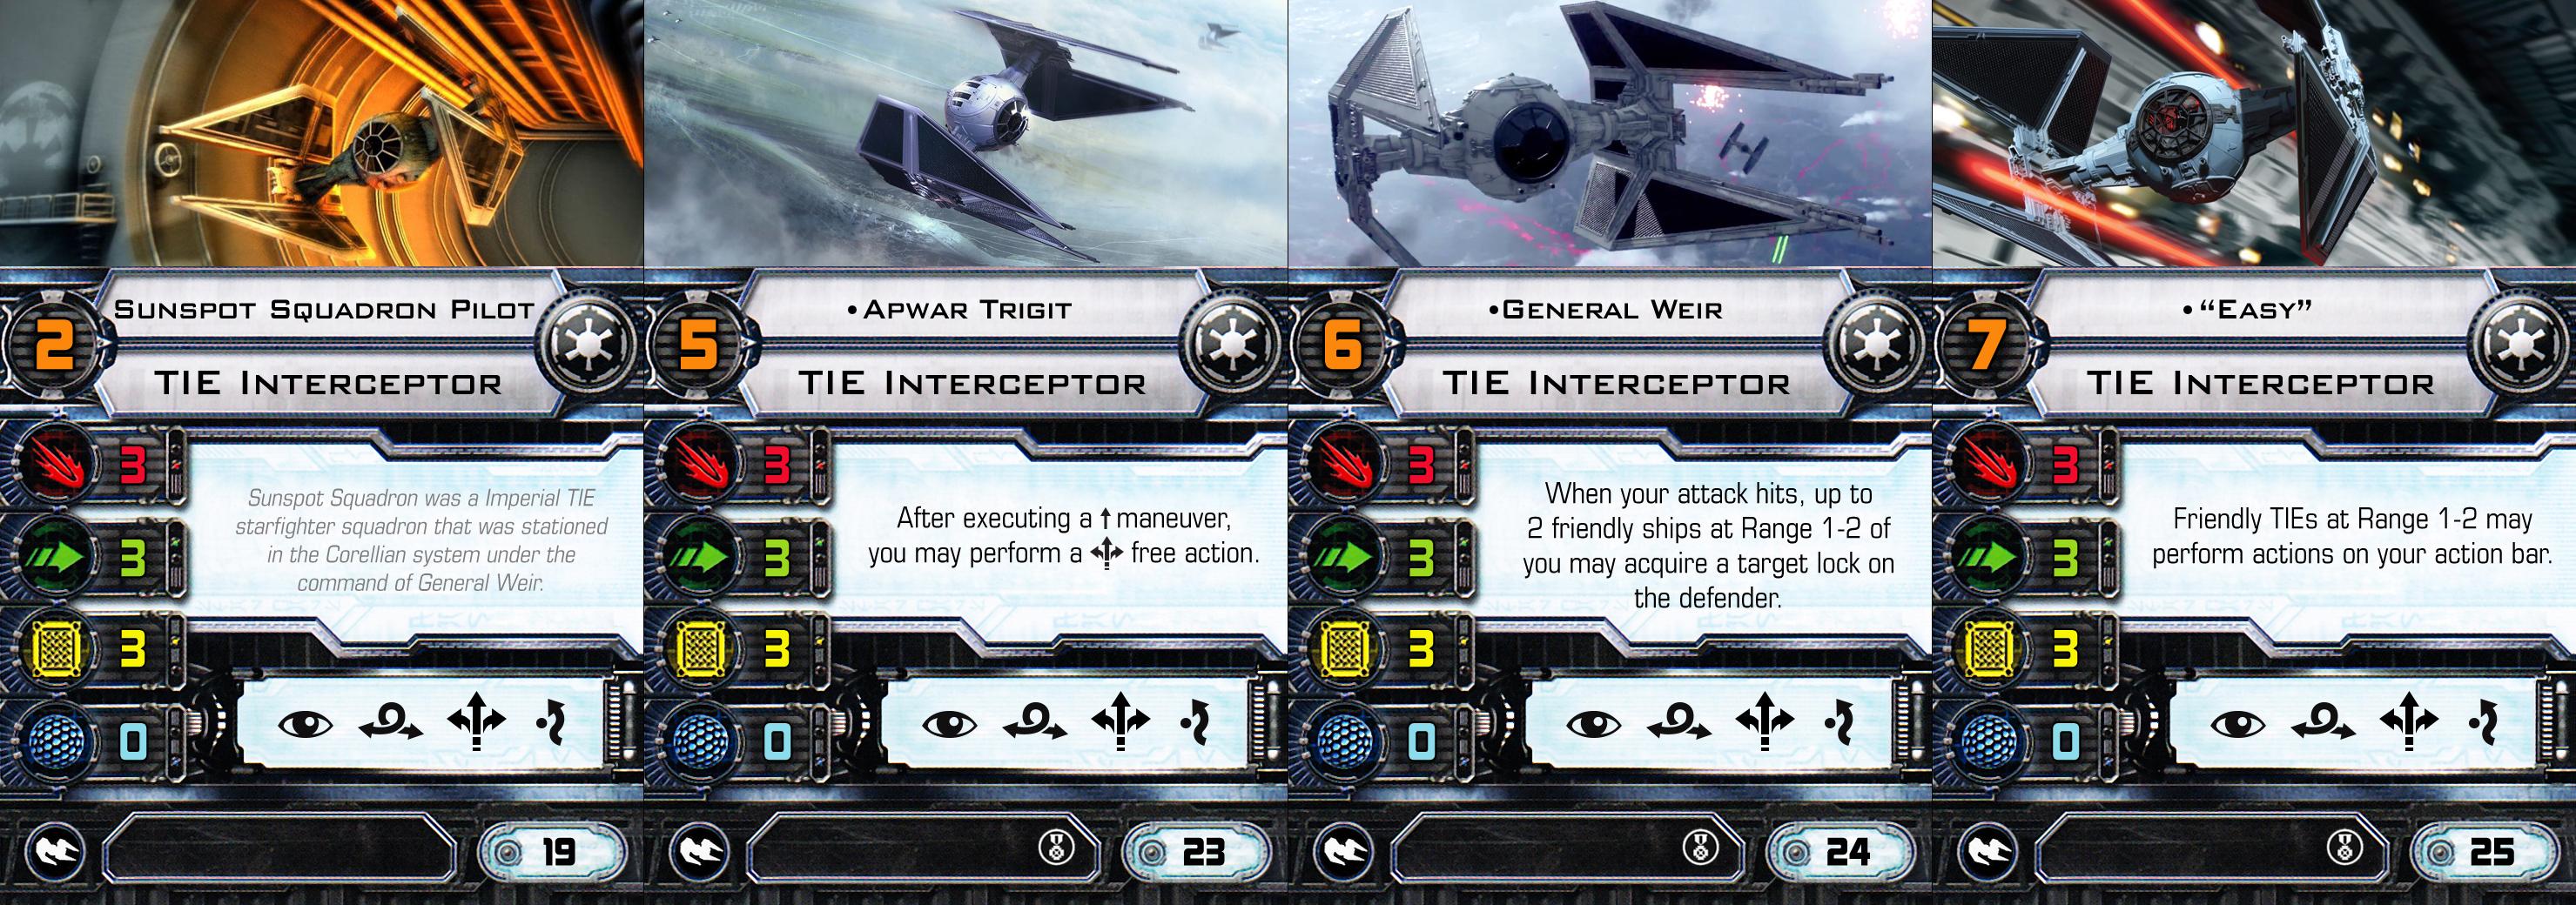 x_wing_miniatures__tie_interceptor_pilot